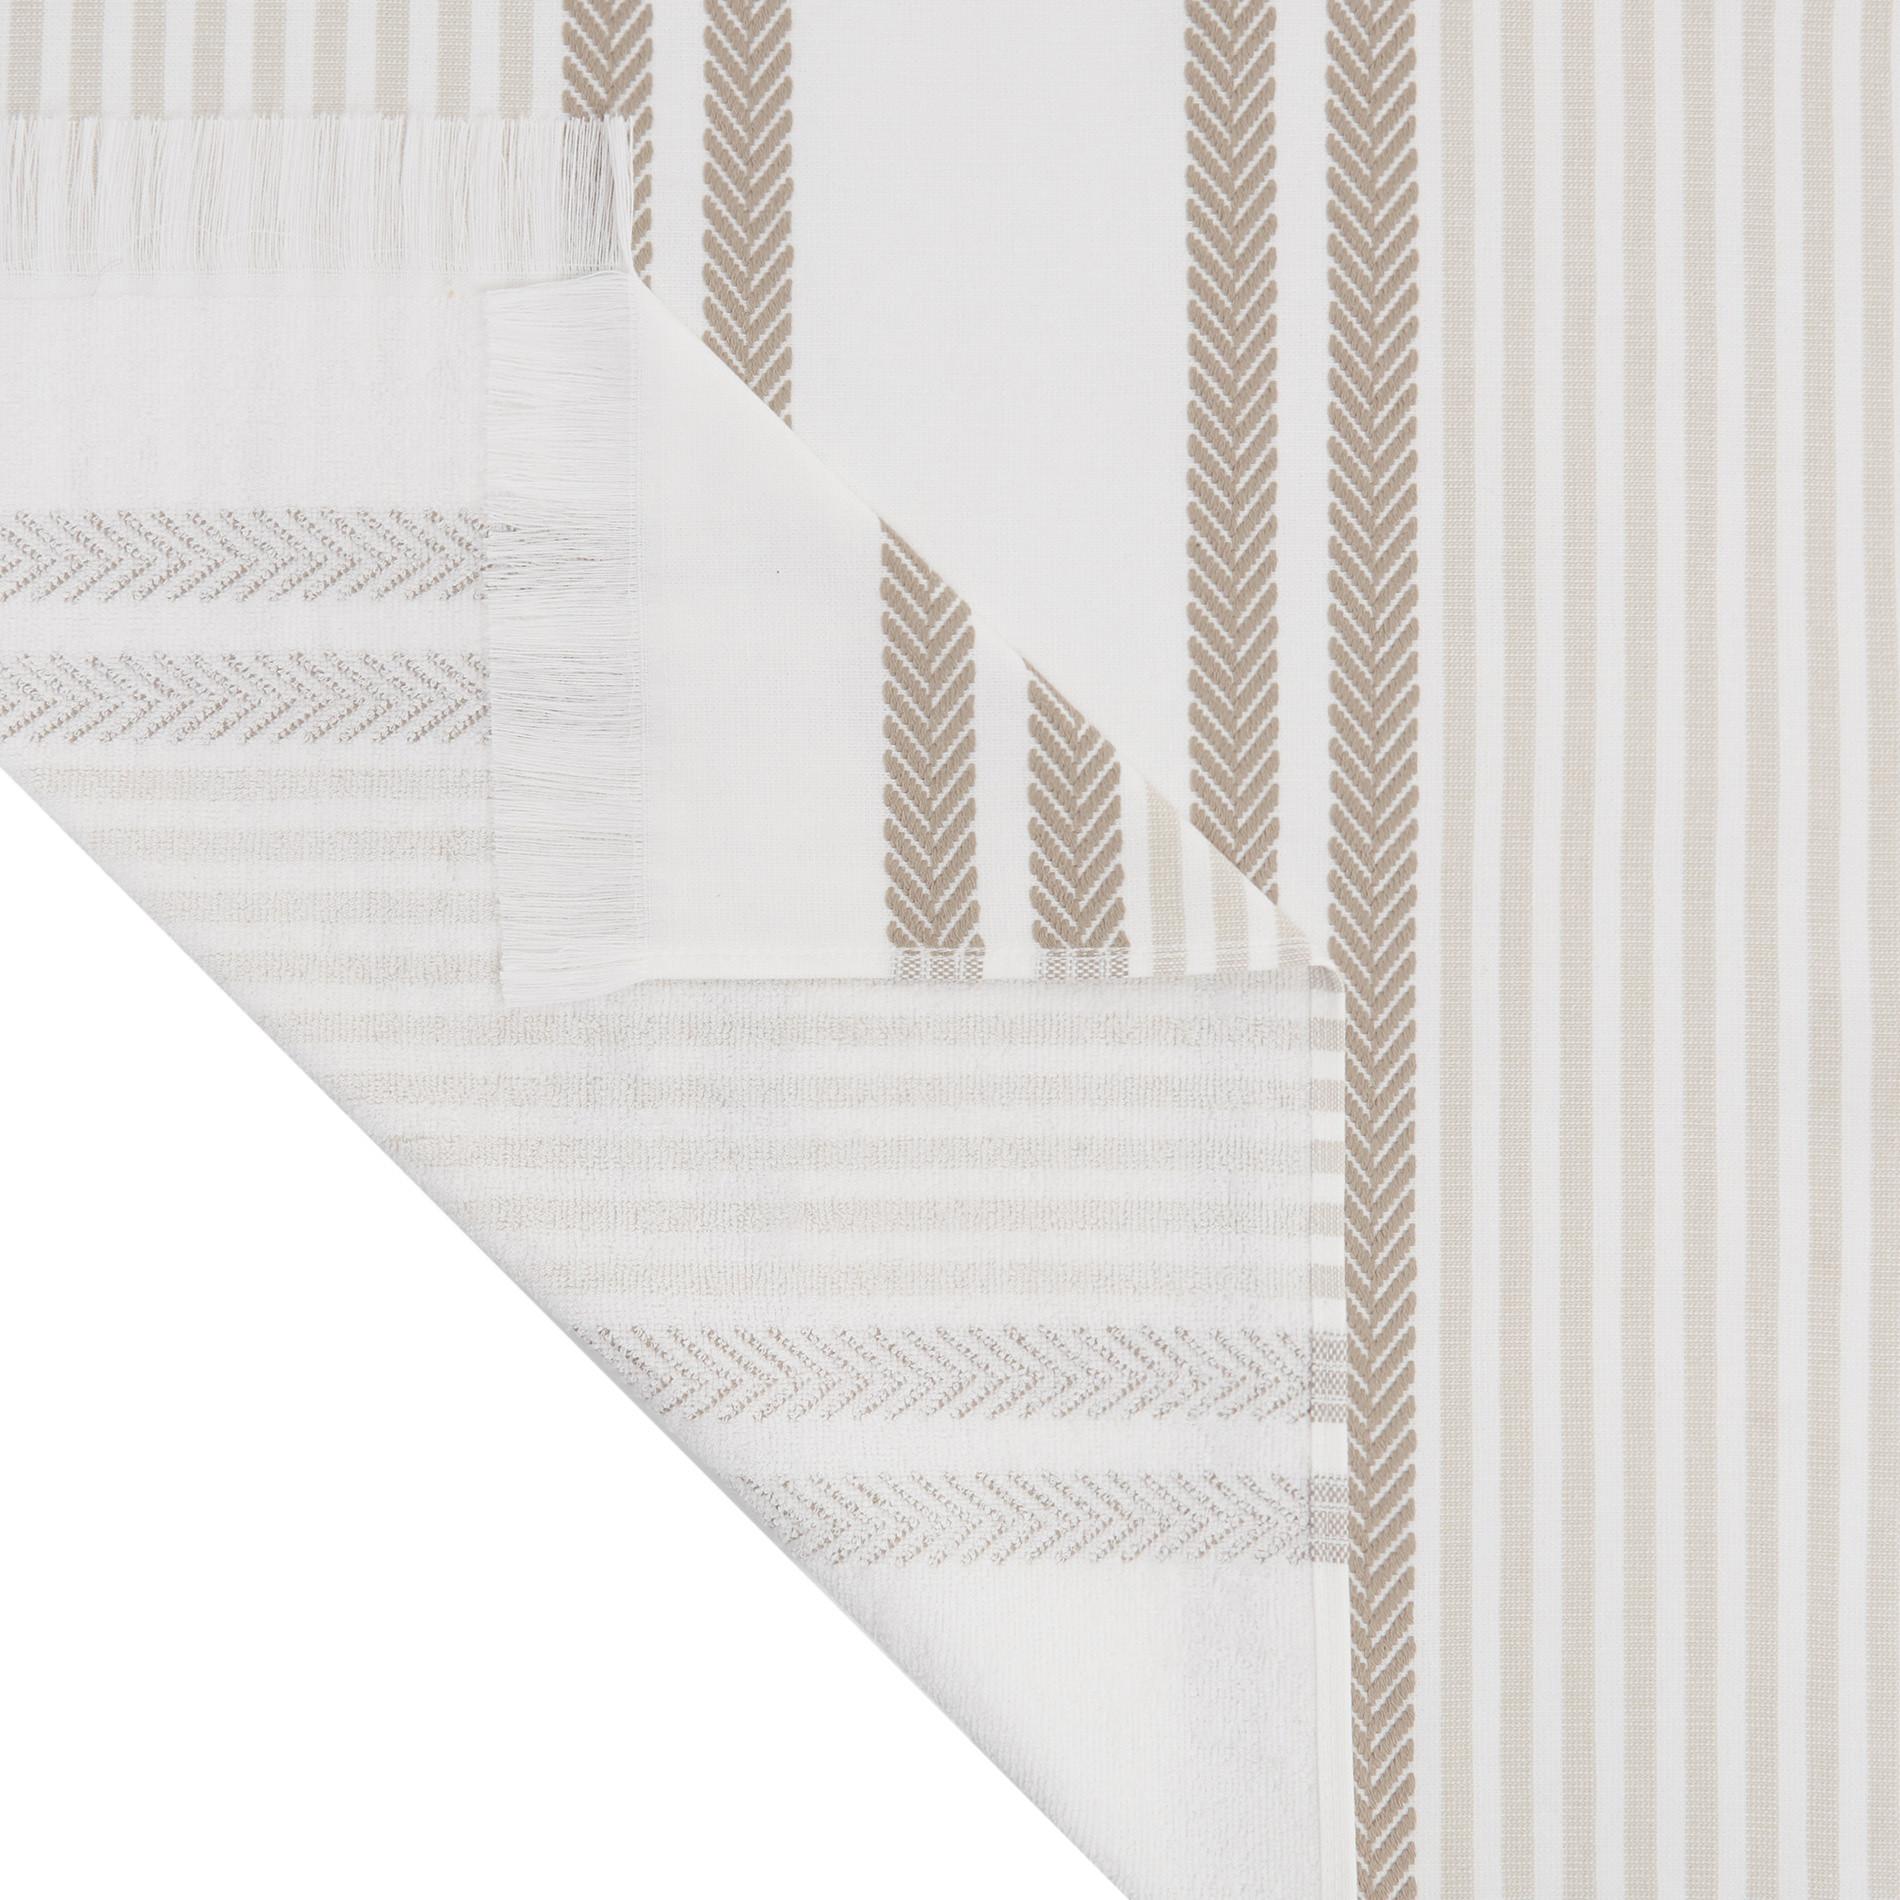 Telo mare hammam cotone jacquard tinto filo a righe, Bianco, large image number 1